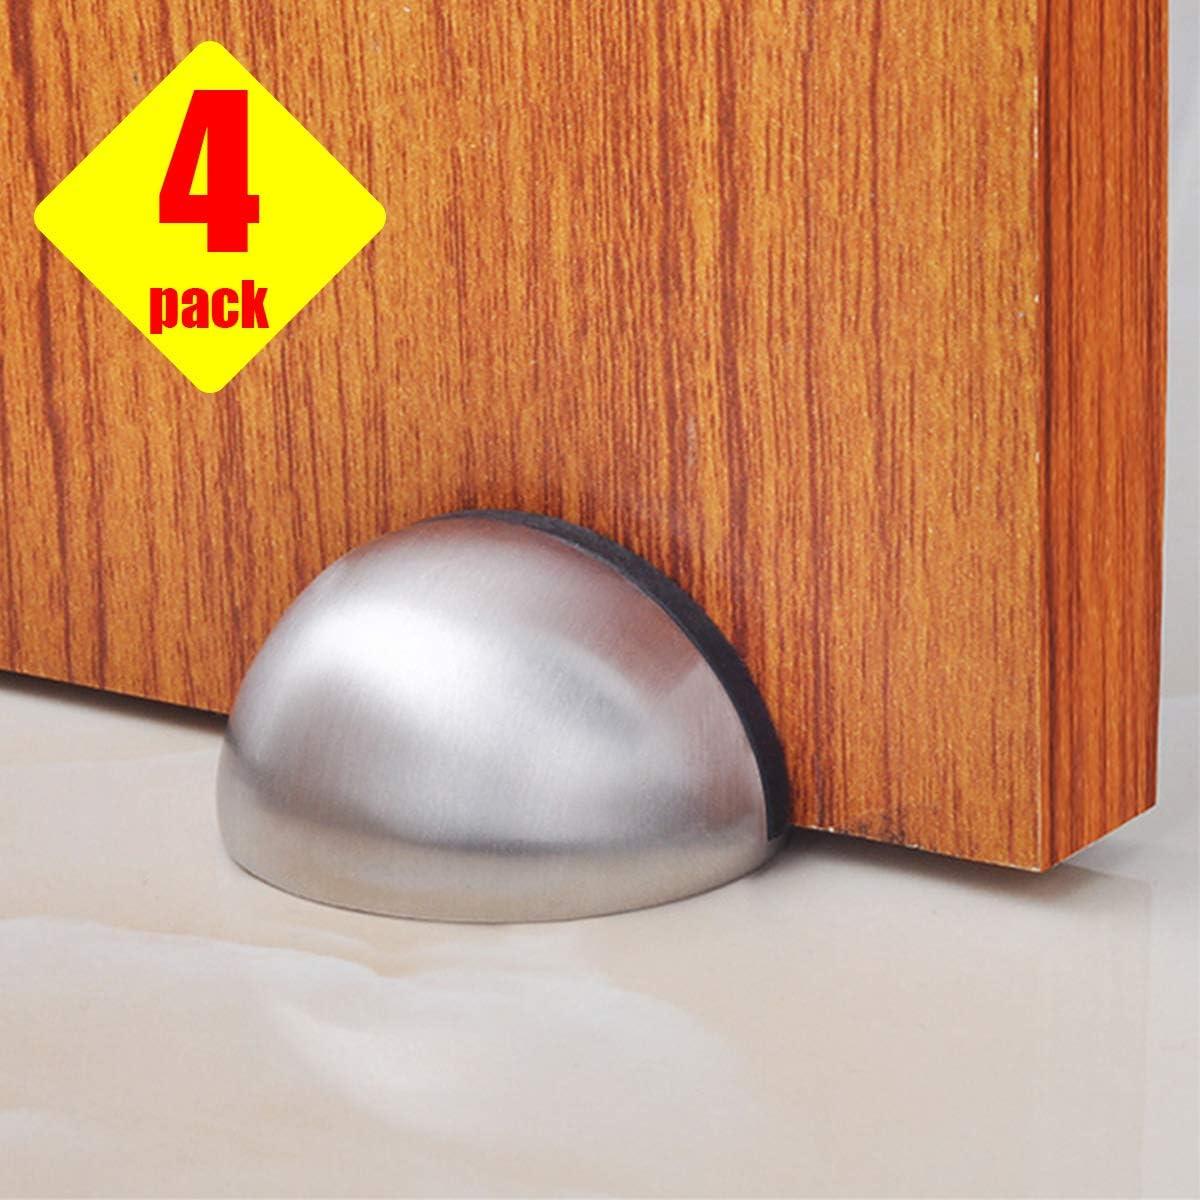 Door Stops, Magnetic Door Stopper,Stainless Steel Modern Soft-Catch Magnetic Door Stop,3M Adhesive Tape, No Drilling, Heavy Duty Brushed Satin Nickel Chrome Magnetic Door Stops, 4 Pack Silver